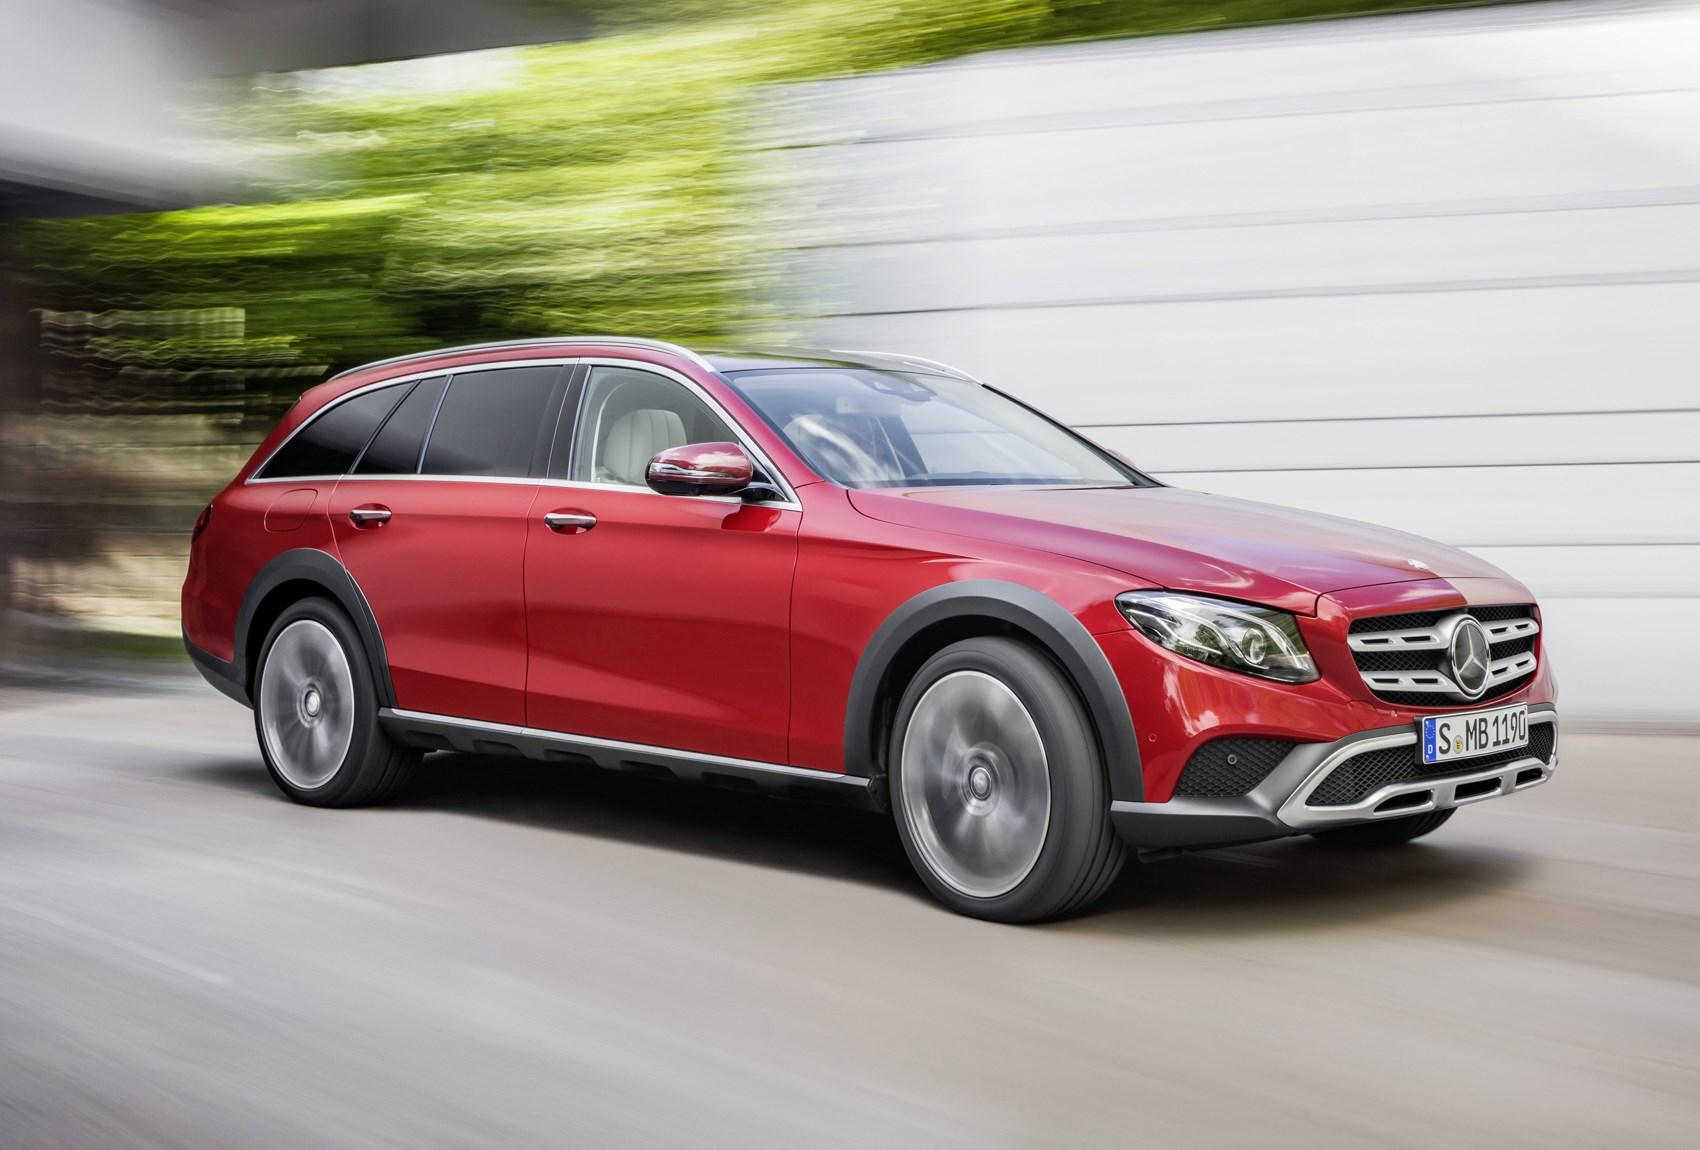 Mercedes benz e class all terrain review 2017 parkers for Mercedes benz westminster colorado